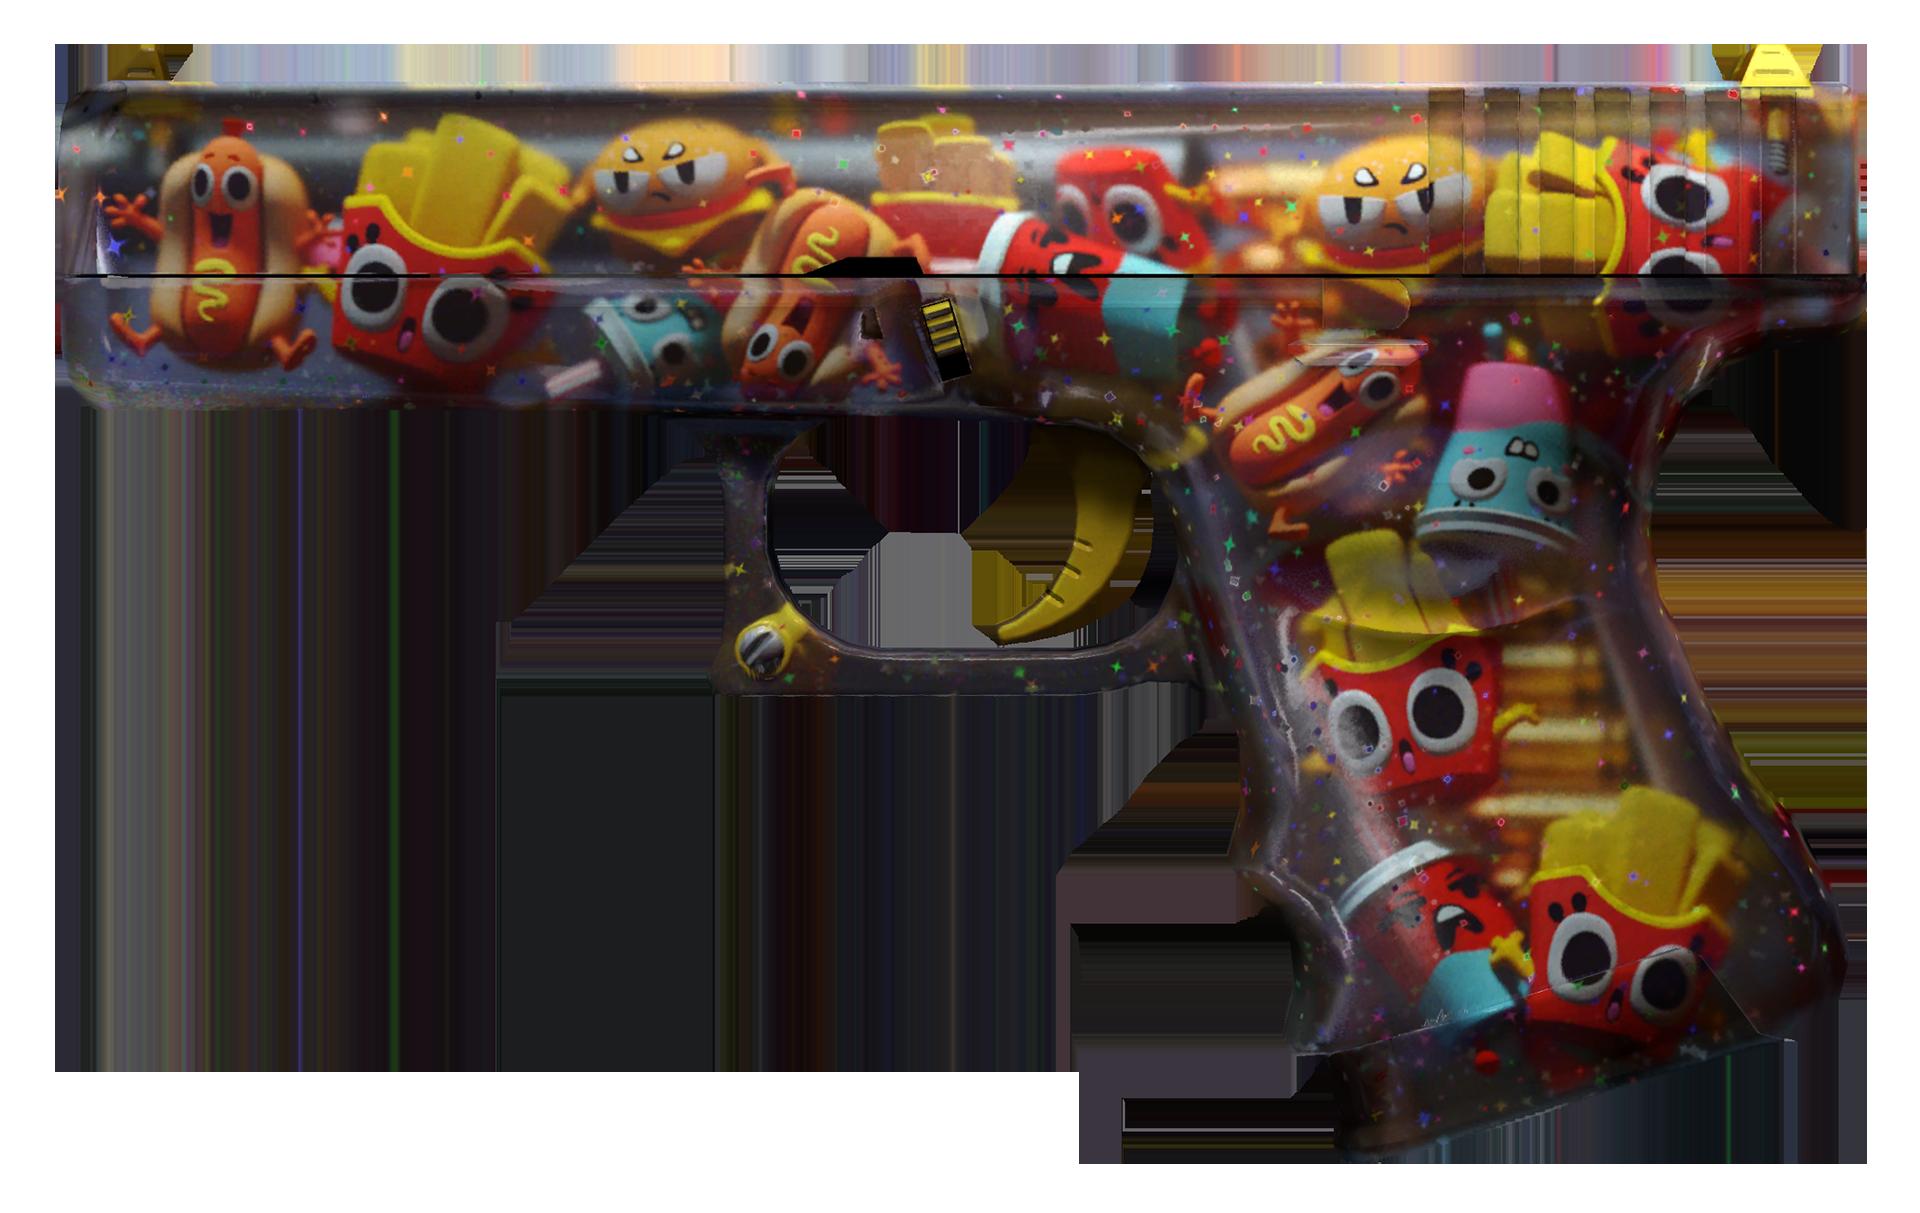 Glock-18 Snack Attack Large Rendering